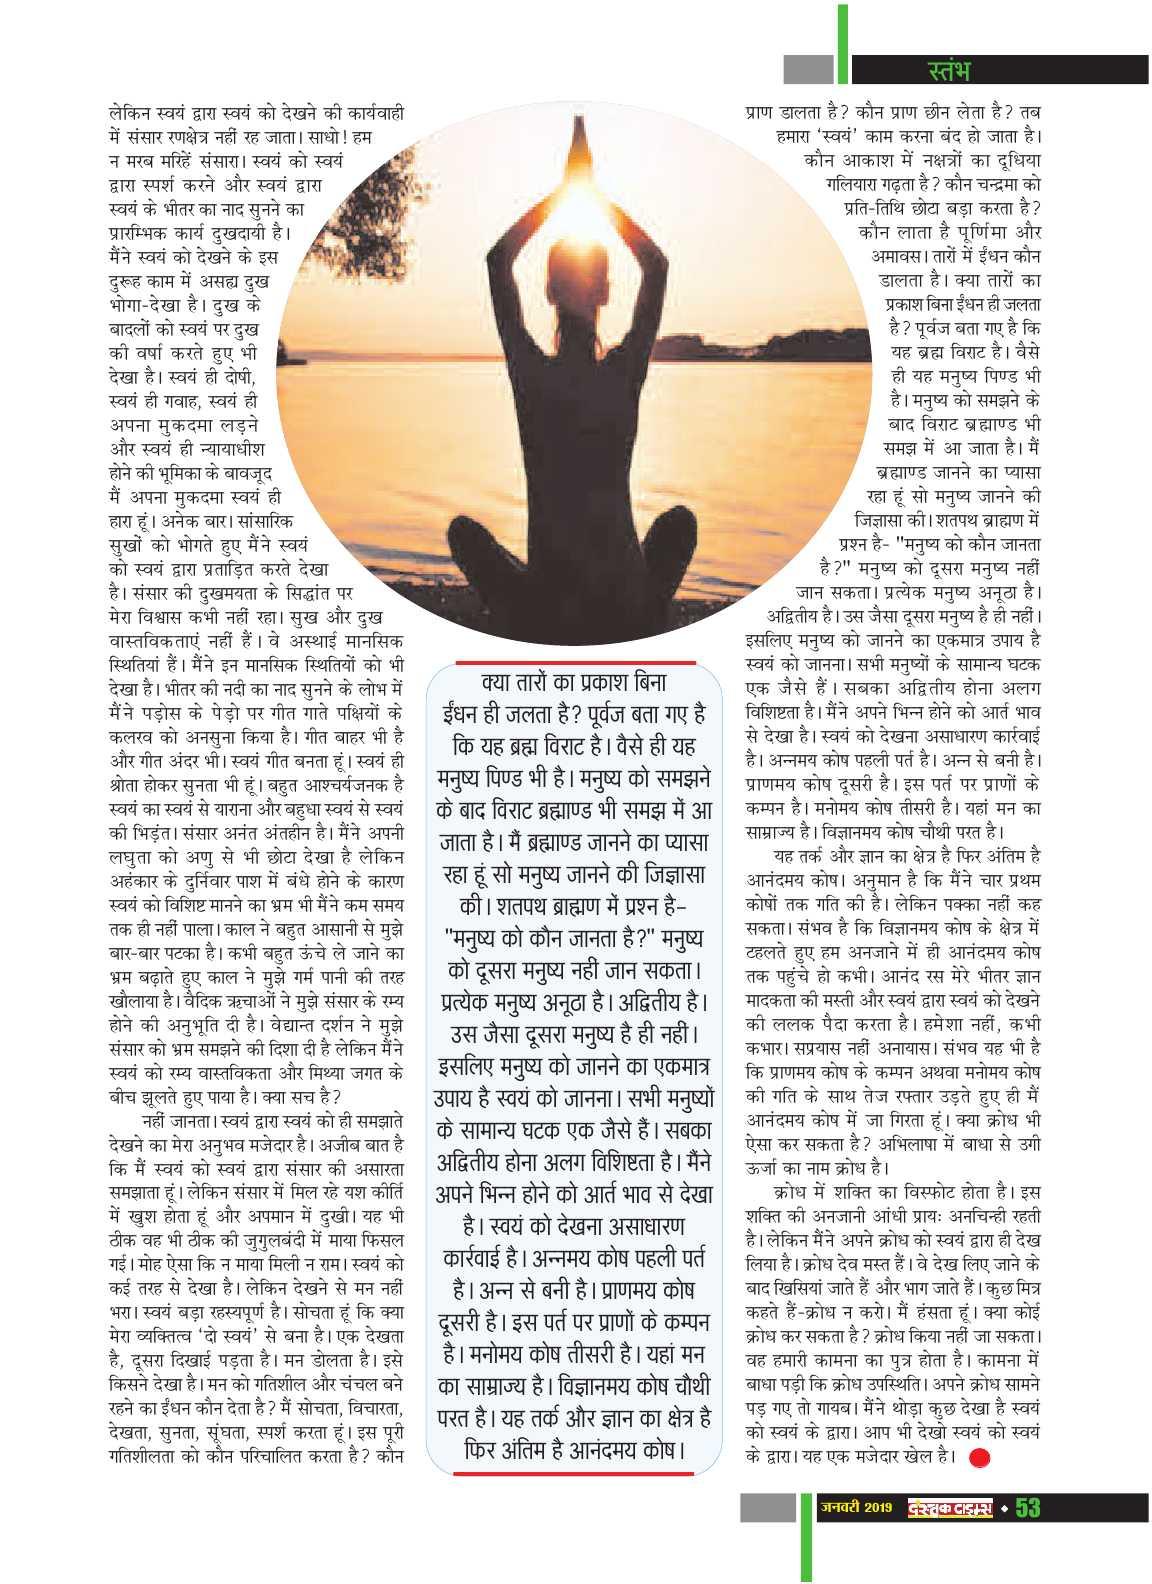 Dastak Times for E-Magazine 15 Jan 2019 new55